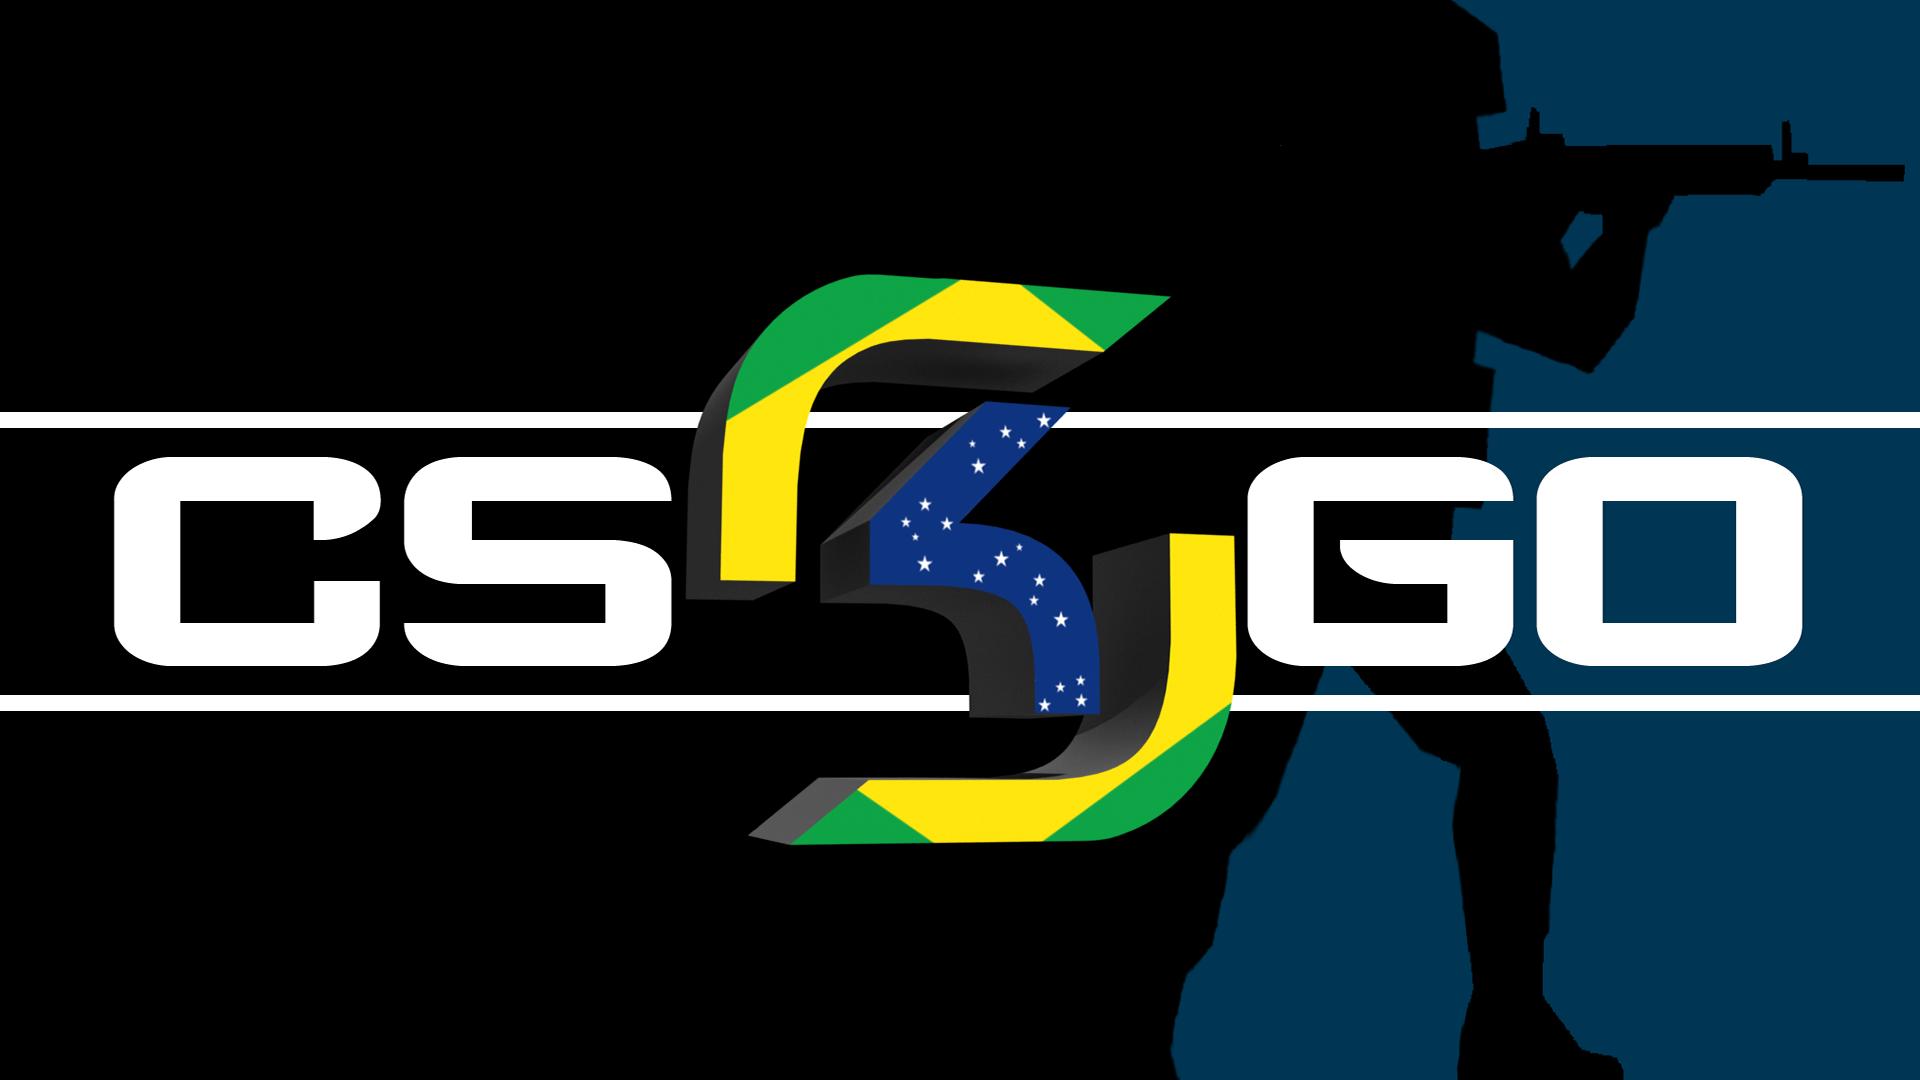 SK TEAM Brazilian  Wallpaper